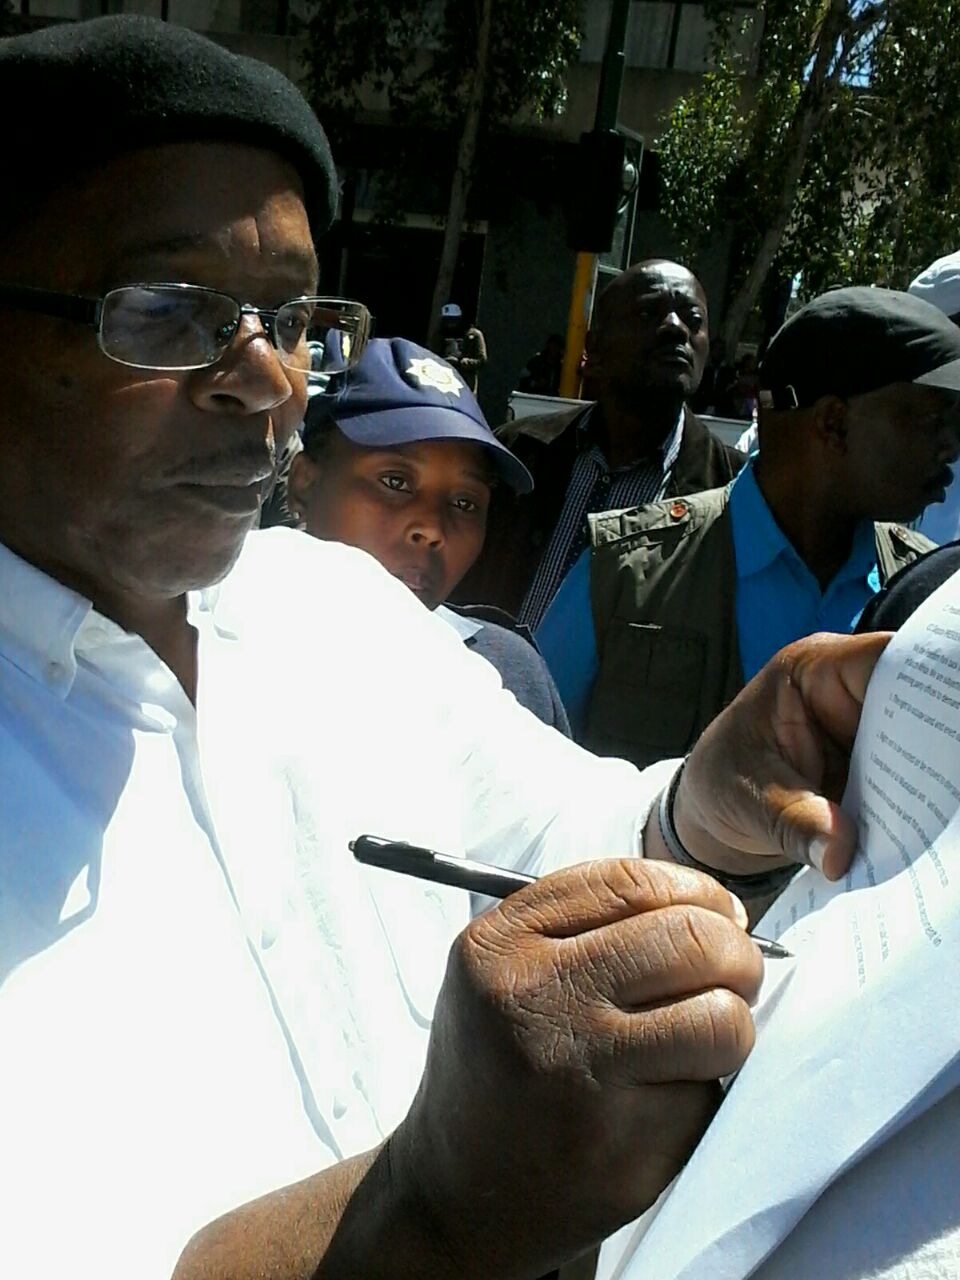 Babylon Xeketwana of the ANC receiving the memorandum.